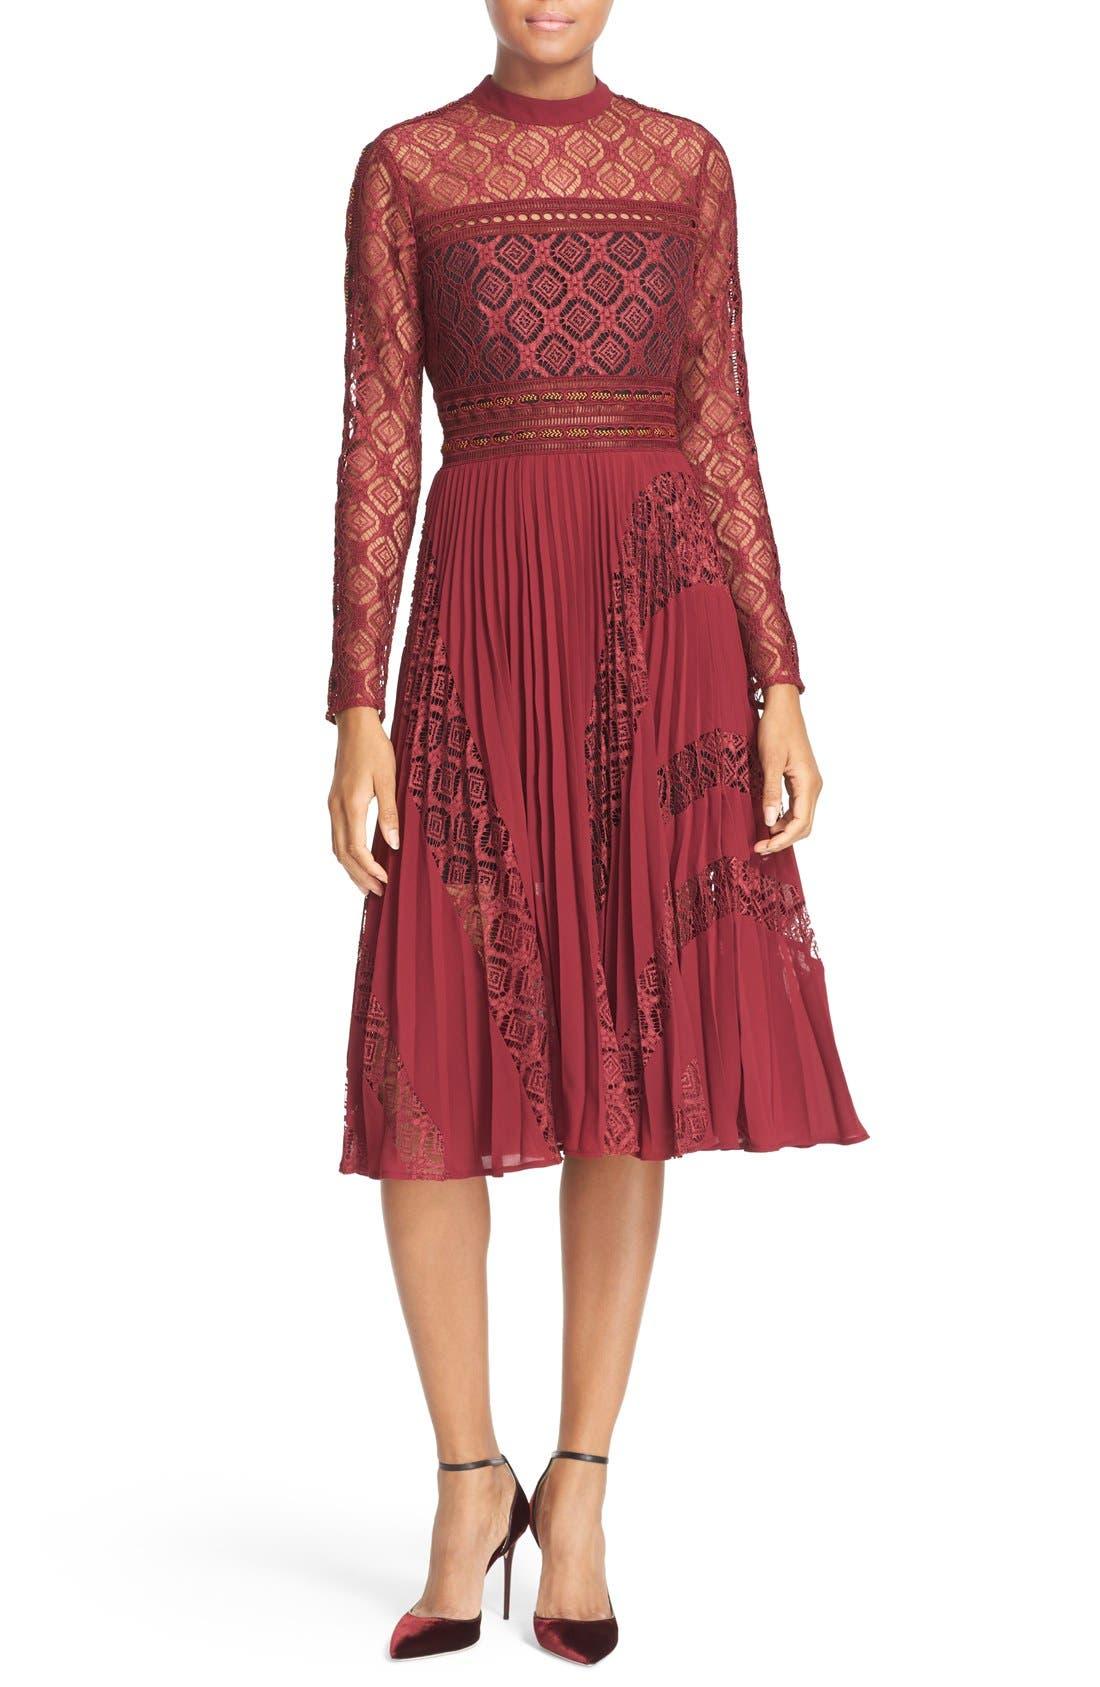 Alternate Image 1 Selected - Self-Portrait Symm Lace & Chiffon Midi Dress